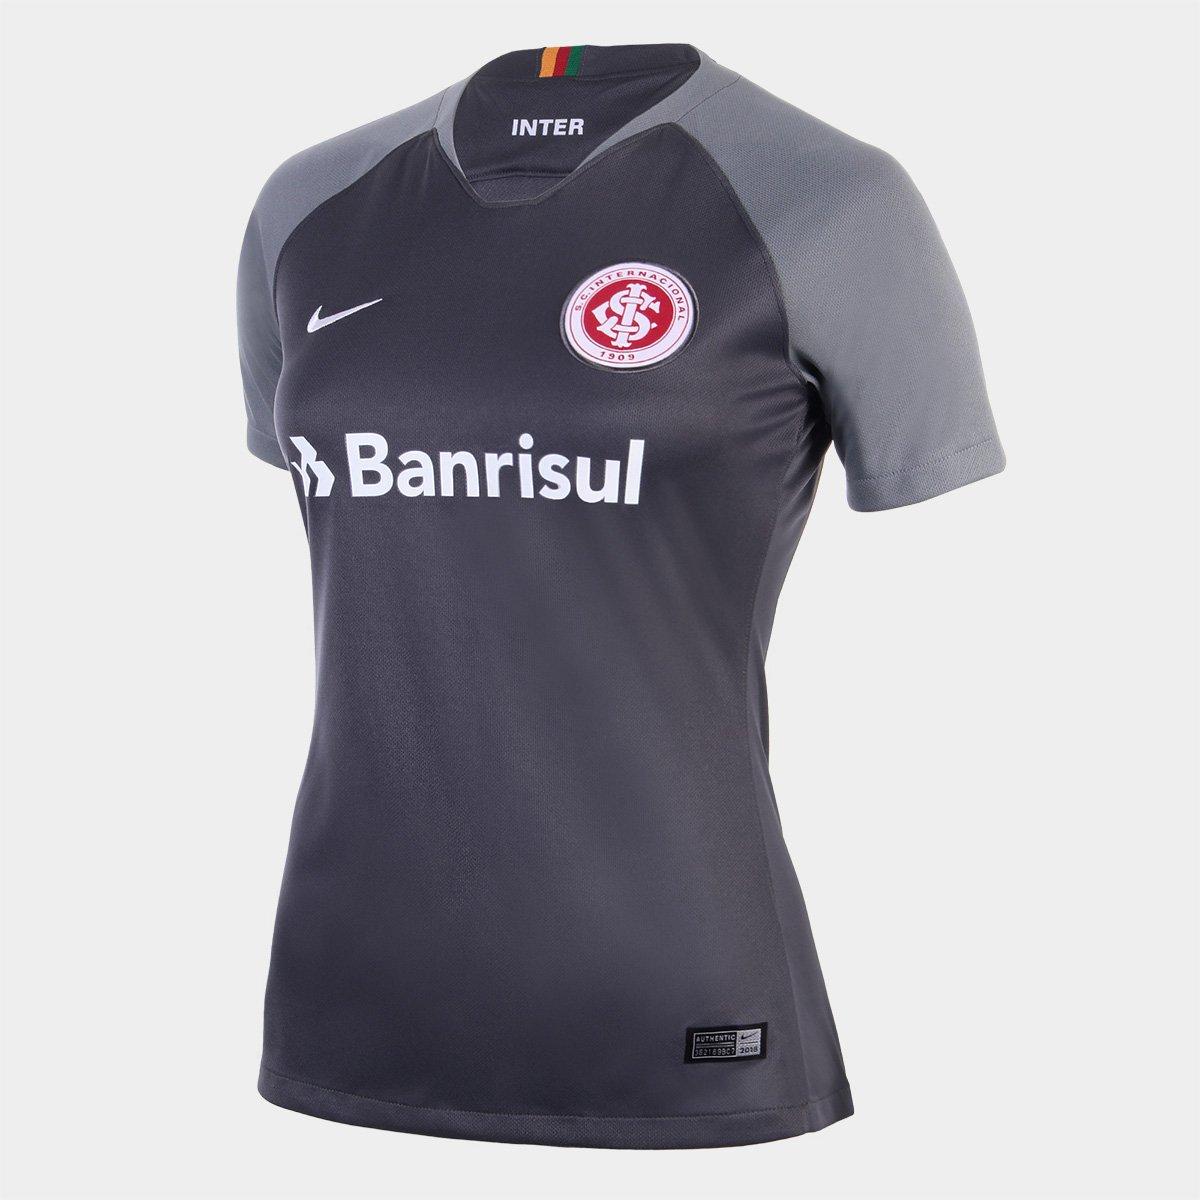 Camisa Internacional III 2018 s n° Torcedor Nike Feminina - Cinza e Branco  - Compre Agora  cdc02620f43